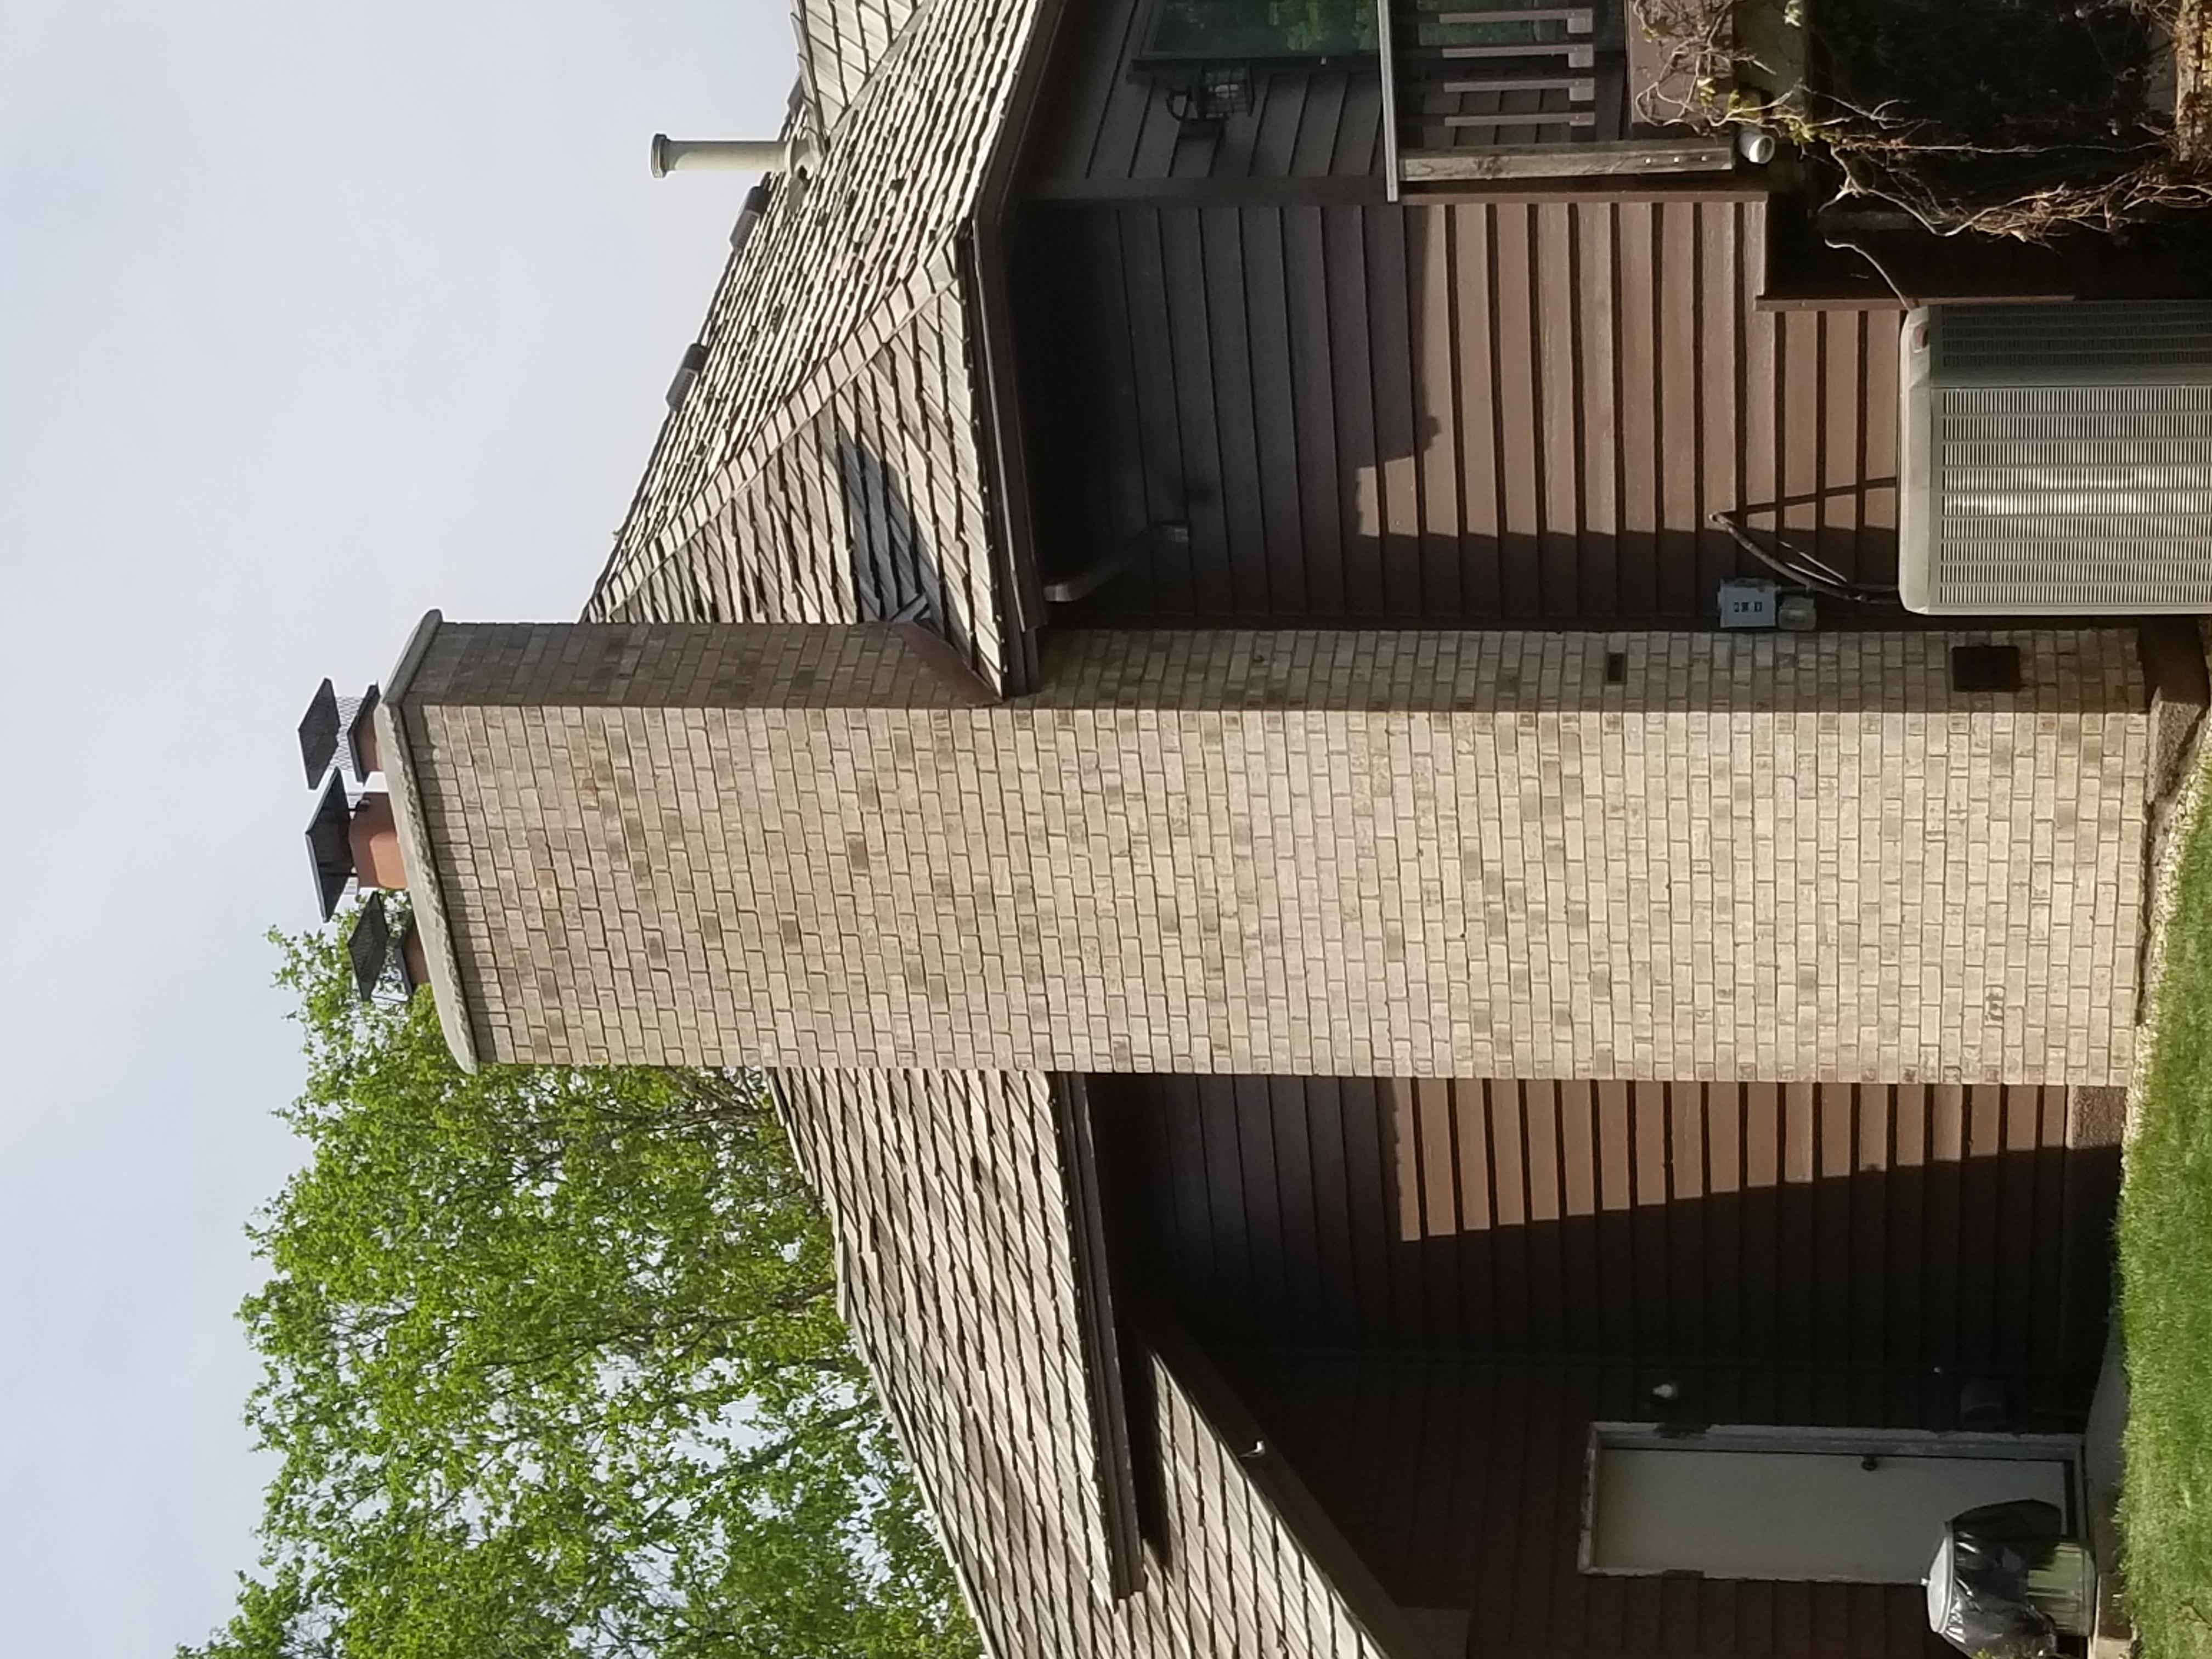 Brick Chimneys (31)